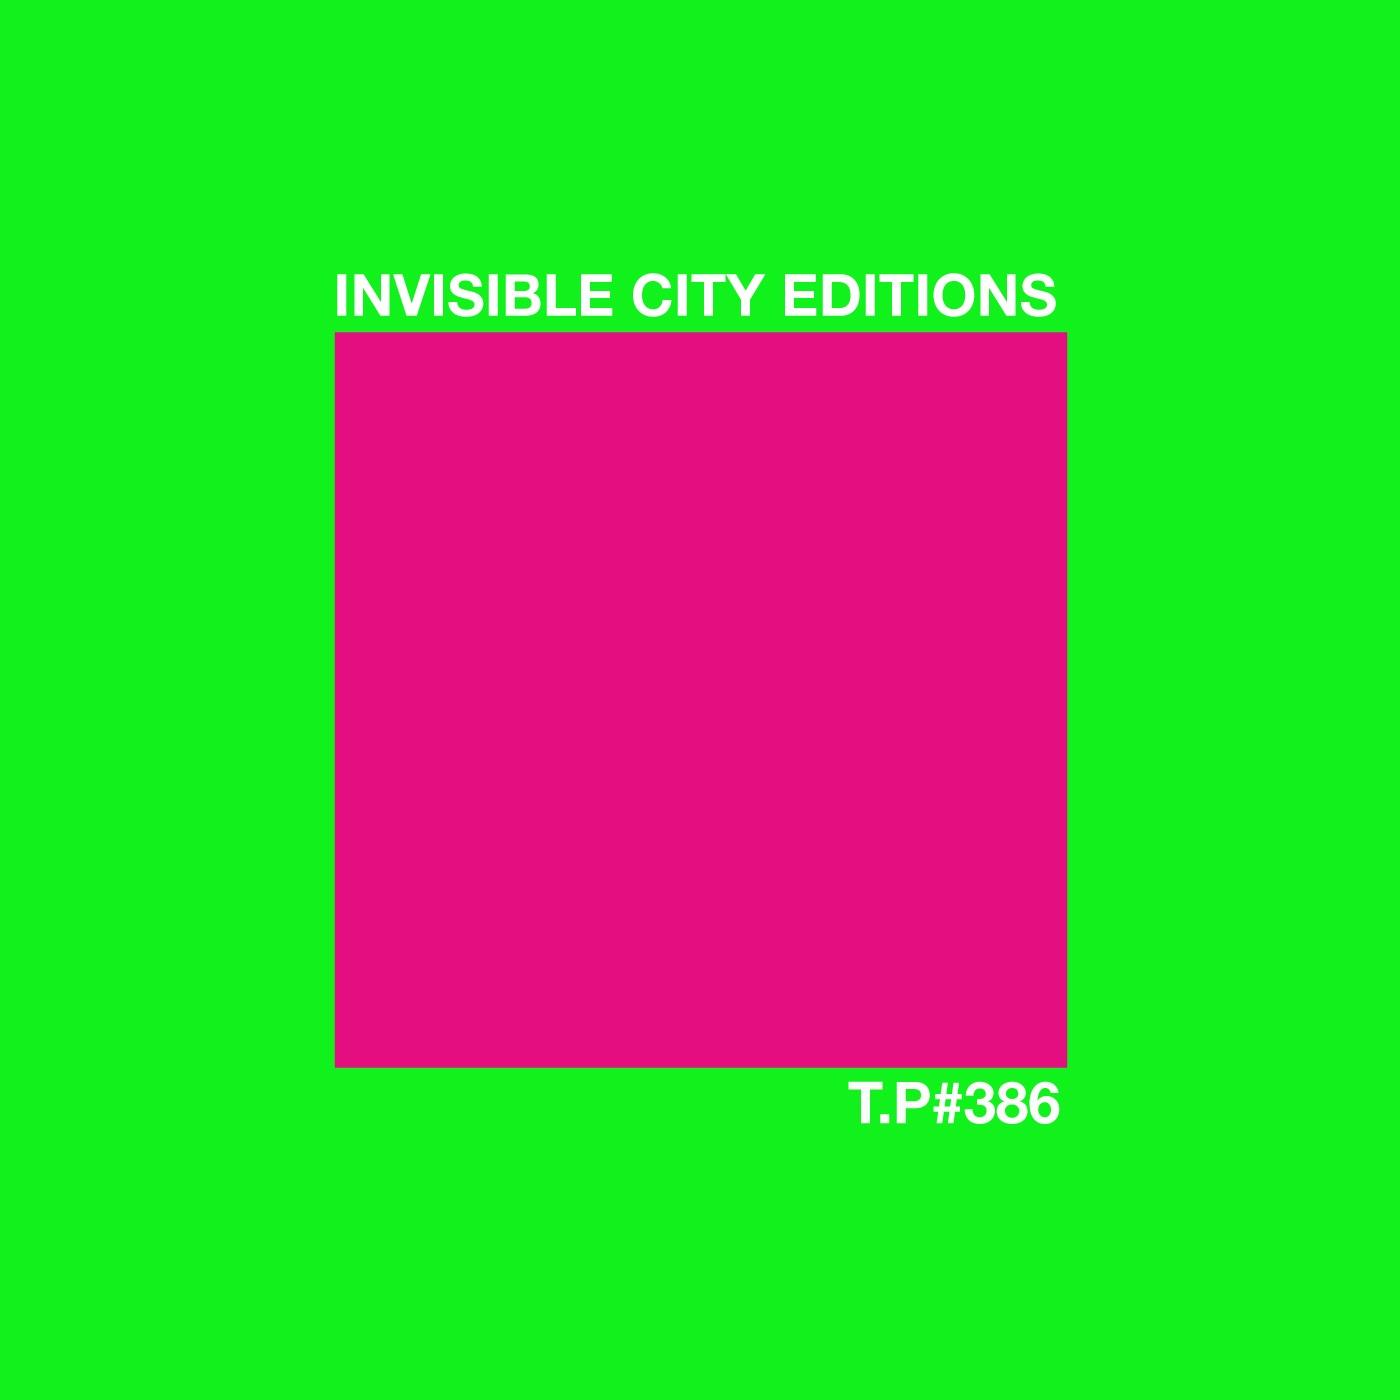 Test Pressing, Mix, Dr Rob, Brandon Hocura, Canada, Invisible City Editons, East Of Garafraxa